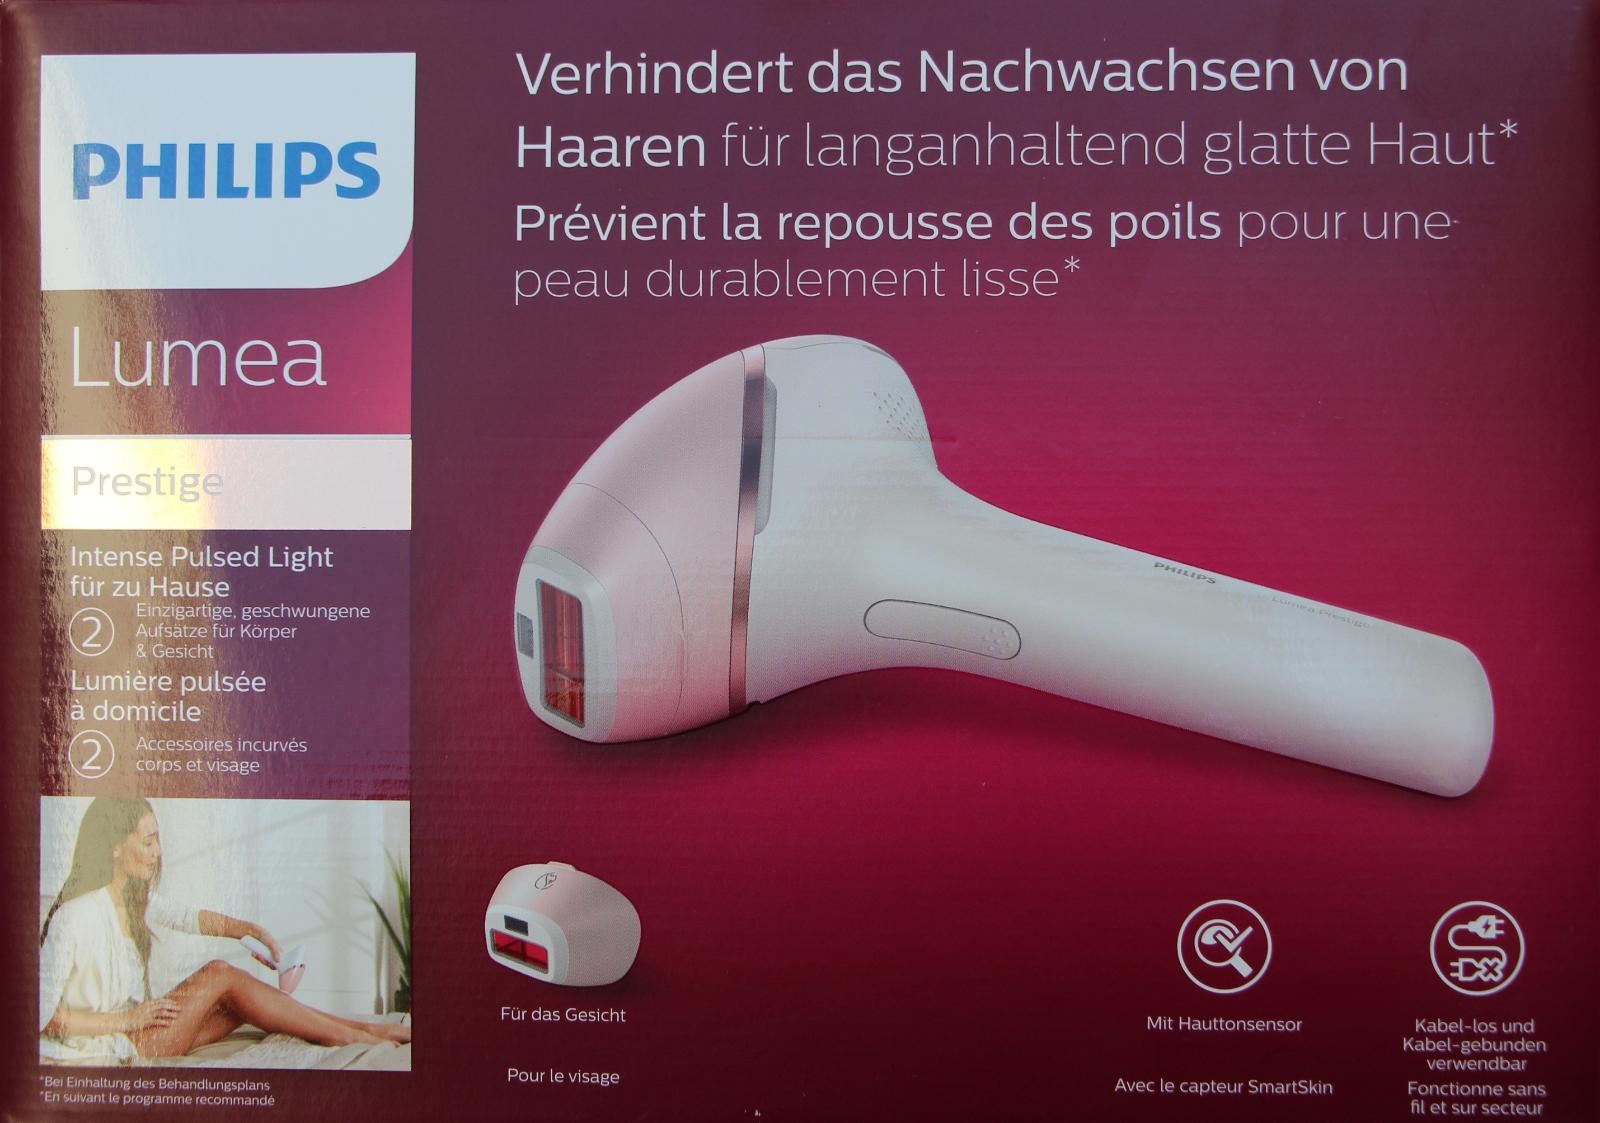 Philips BRI95000 Lumea Prestige IPL Haarentfernungsgerät Körper Gesicht - NEU